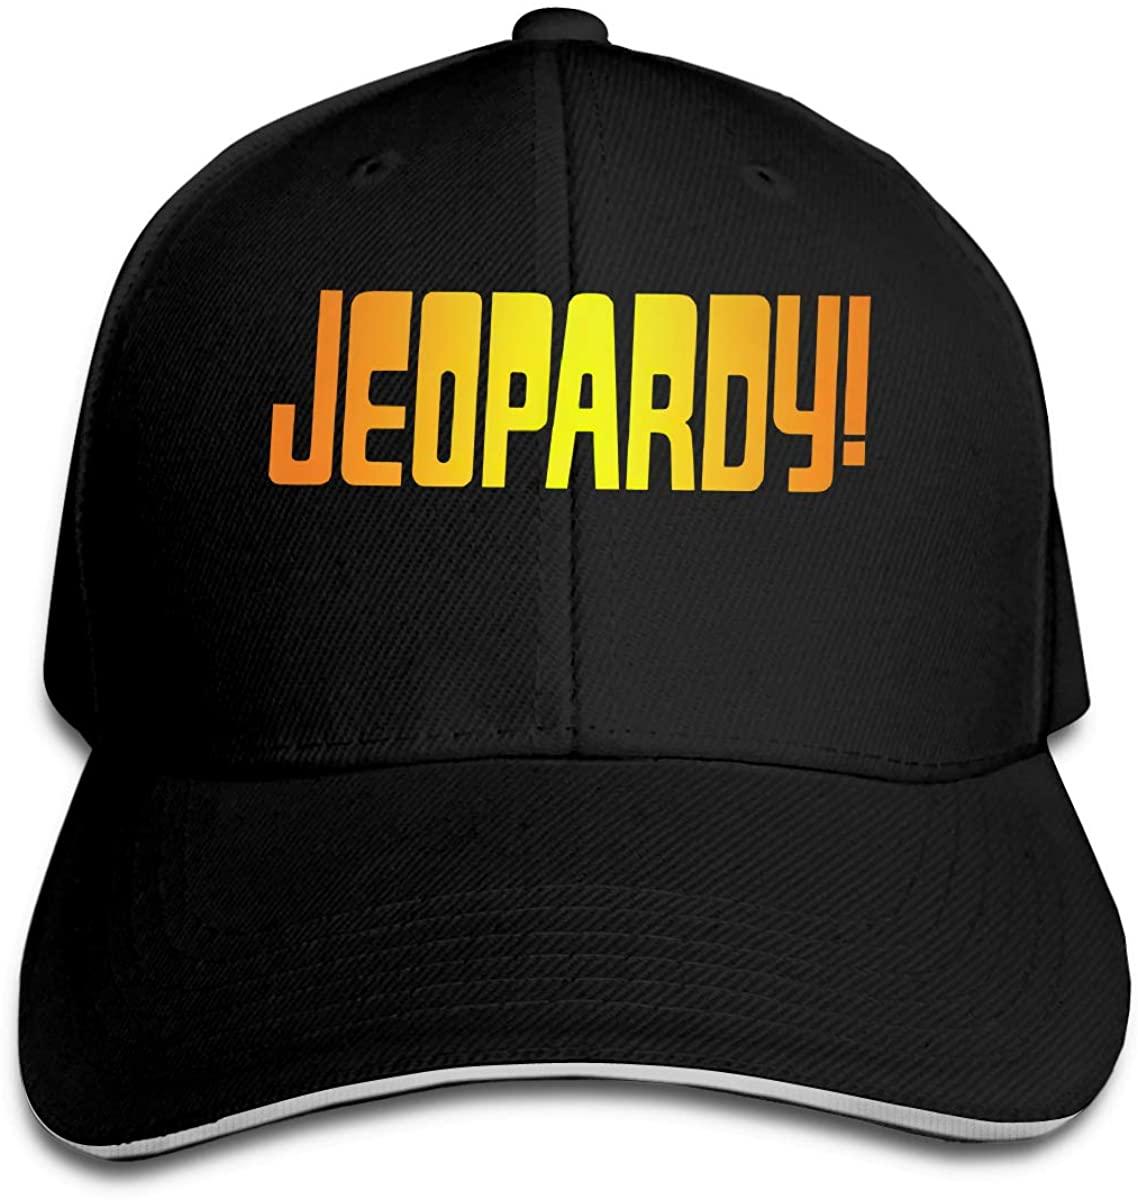 Jeopardy! Hip Hop Baseball Cap Golf Trucker Baseball Cap Adjustable Peaked Sandwich Hat Black Unisex Casquette